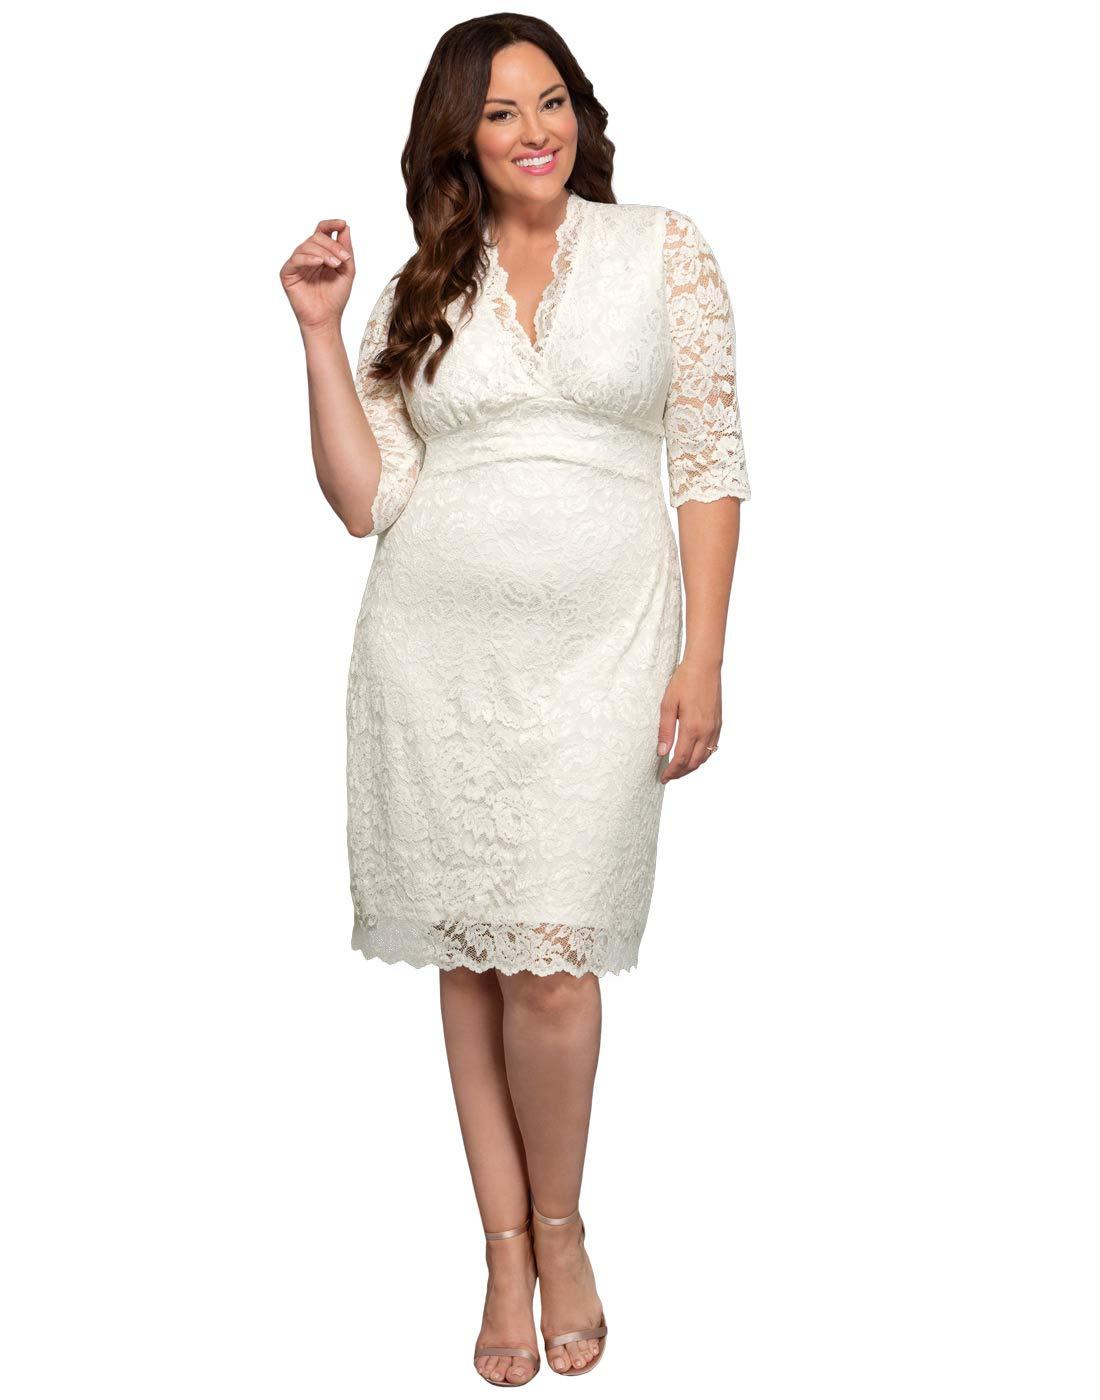 47d2acd8713 Kiyonna Women s Plus Size Luxe Lace Wedding Dress 4X Ivory. Home Brands Kiyonna  Dresses Kiyonna Women s Plus Size Luxe Lace Wedding ...